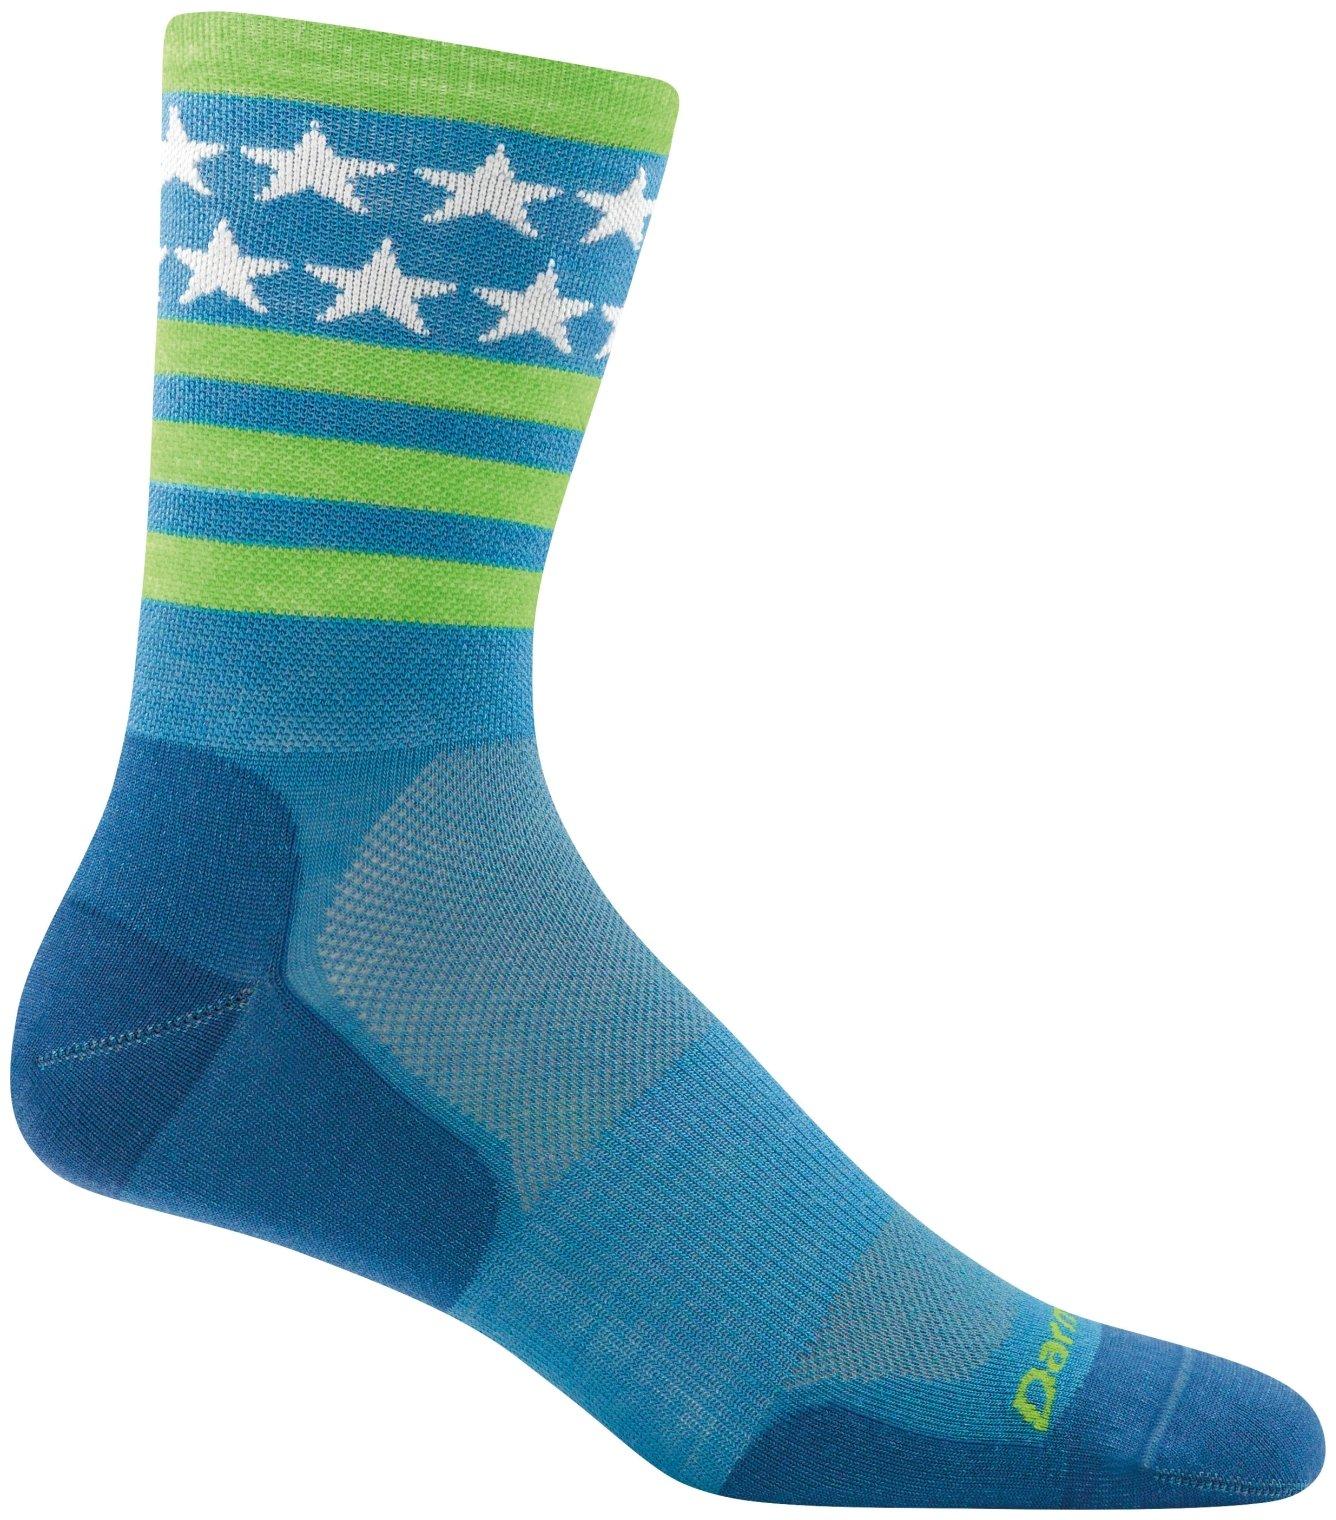 Darn Tough Stars and Stripes Micro Crew Ultralight Sock - Men's Blue X-Large by Darn Tough